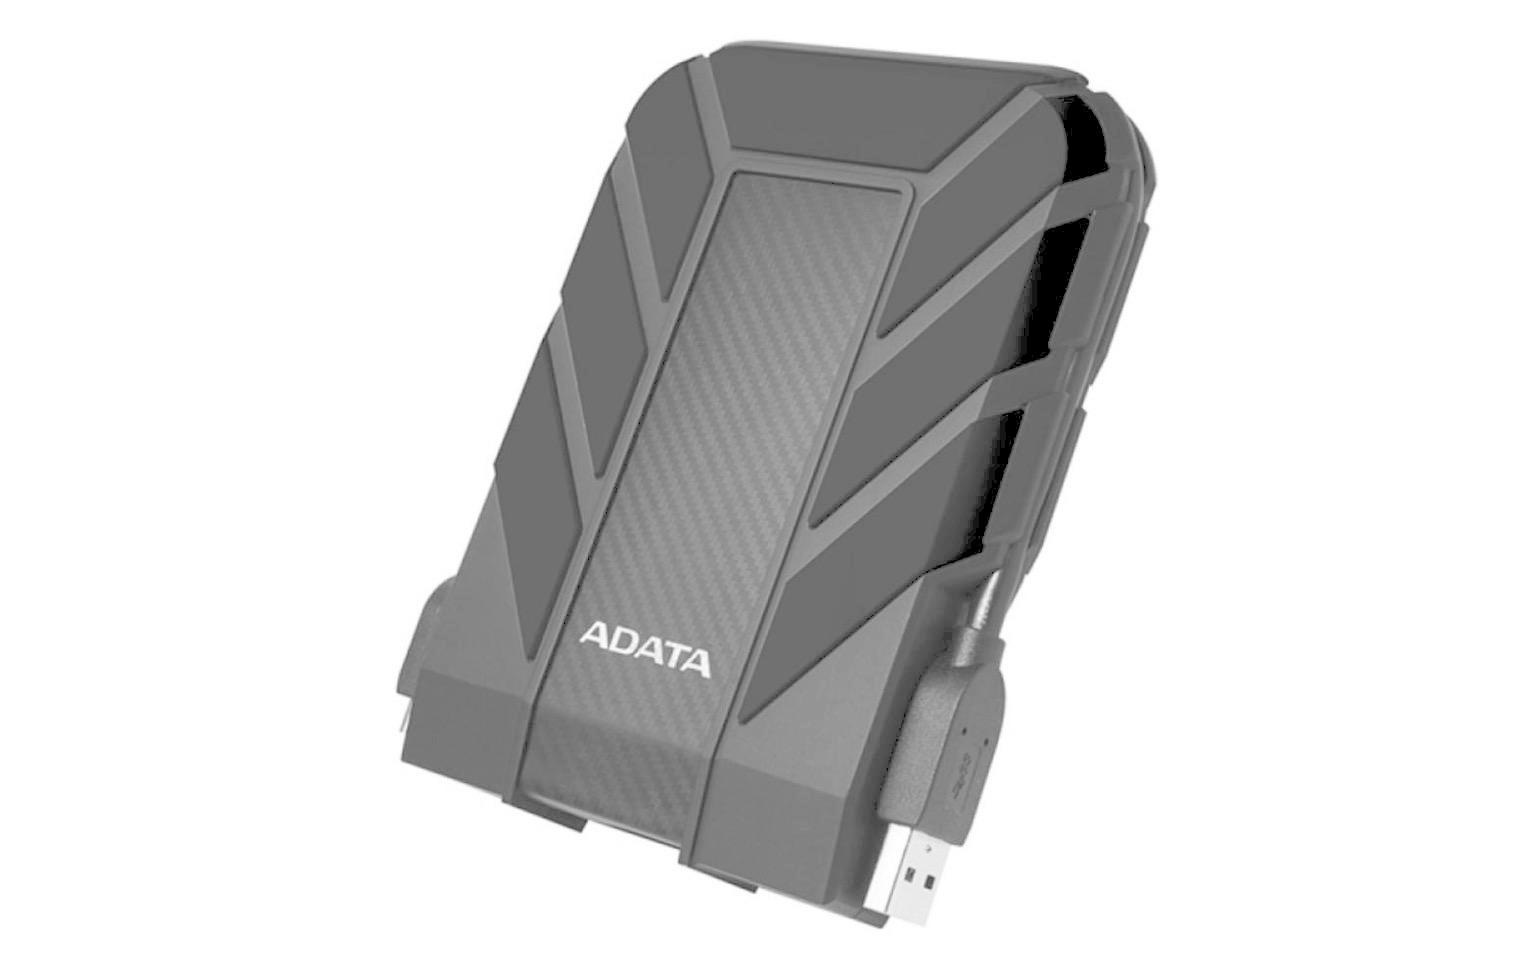 Image of ADATA externe HDD-Festplatte »AHD710 2 TB Schwarz«